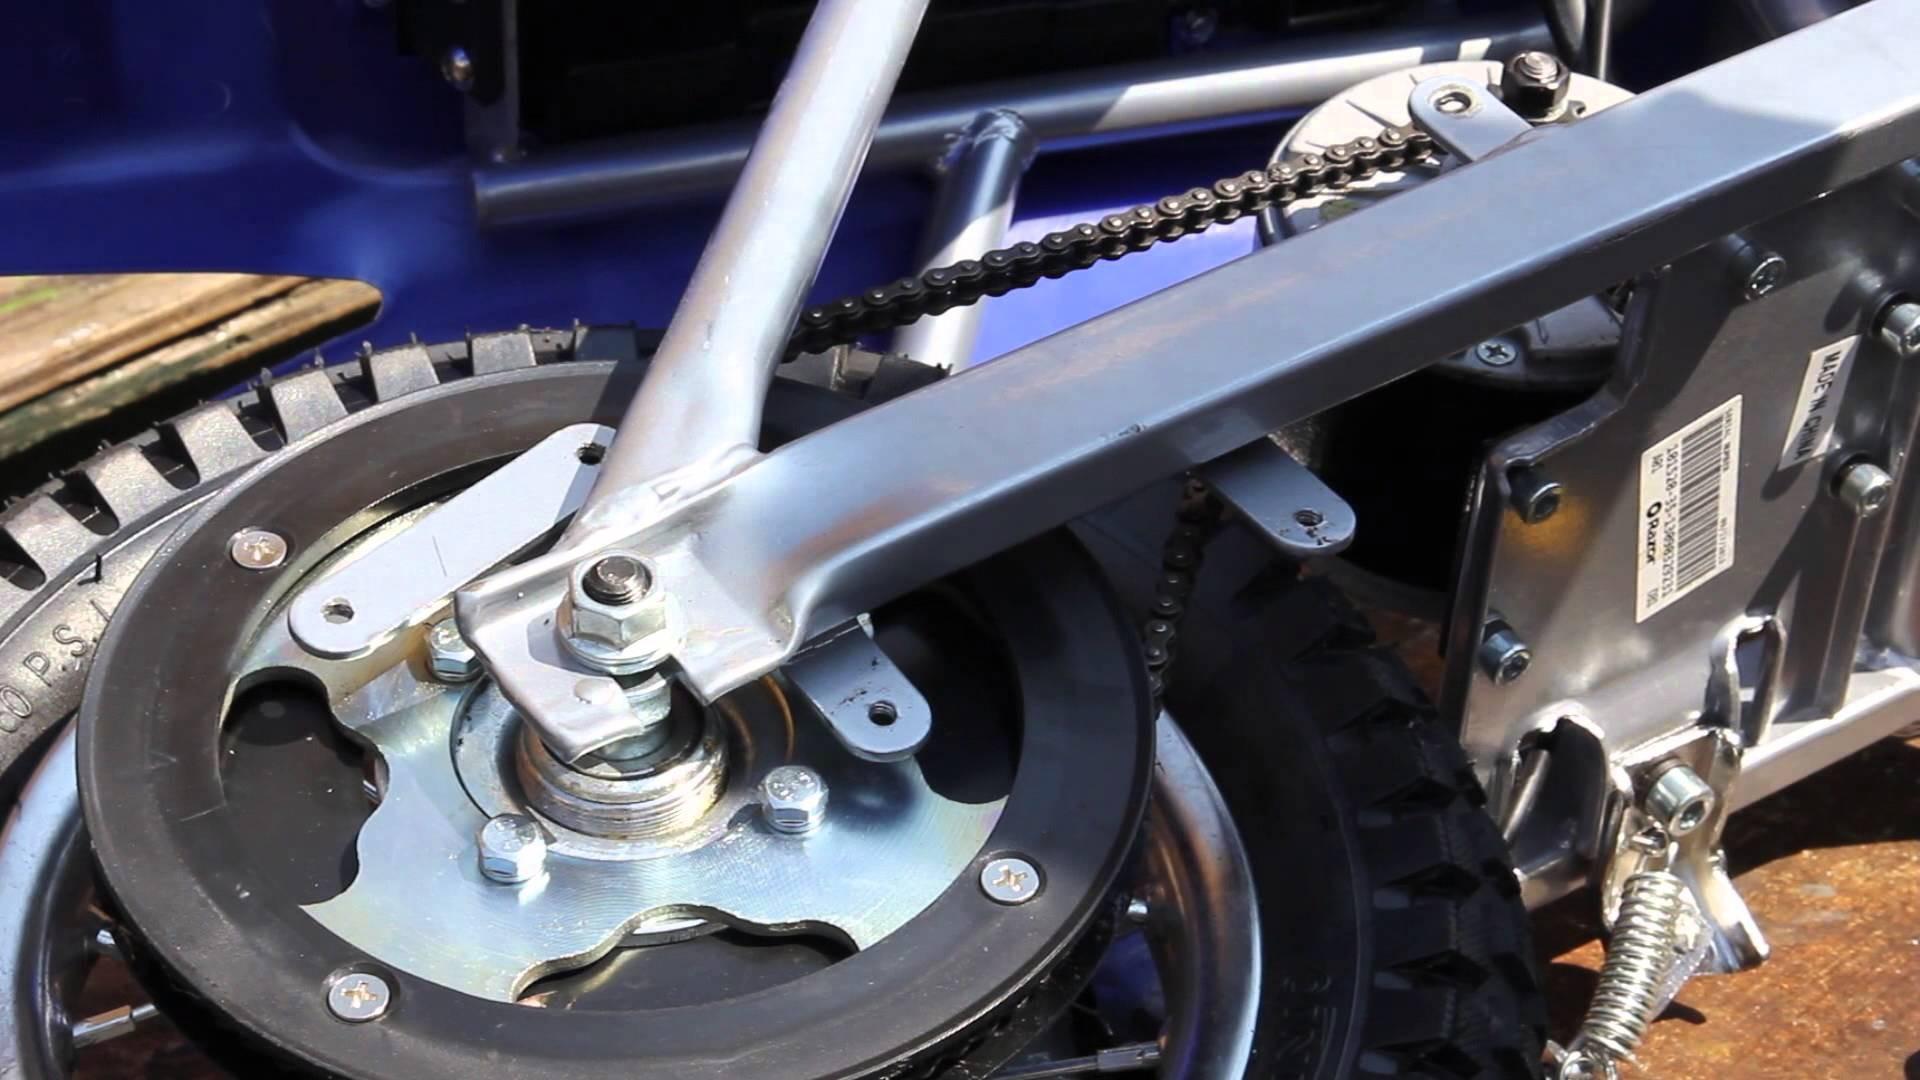 Razor Mini MX Racer Electric Dirt Rocket ZR350 BikemanforU Repair